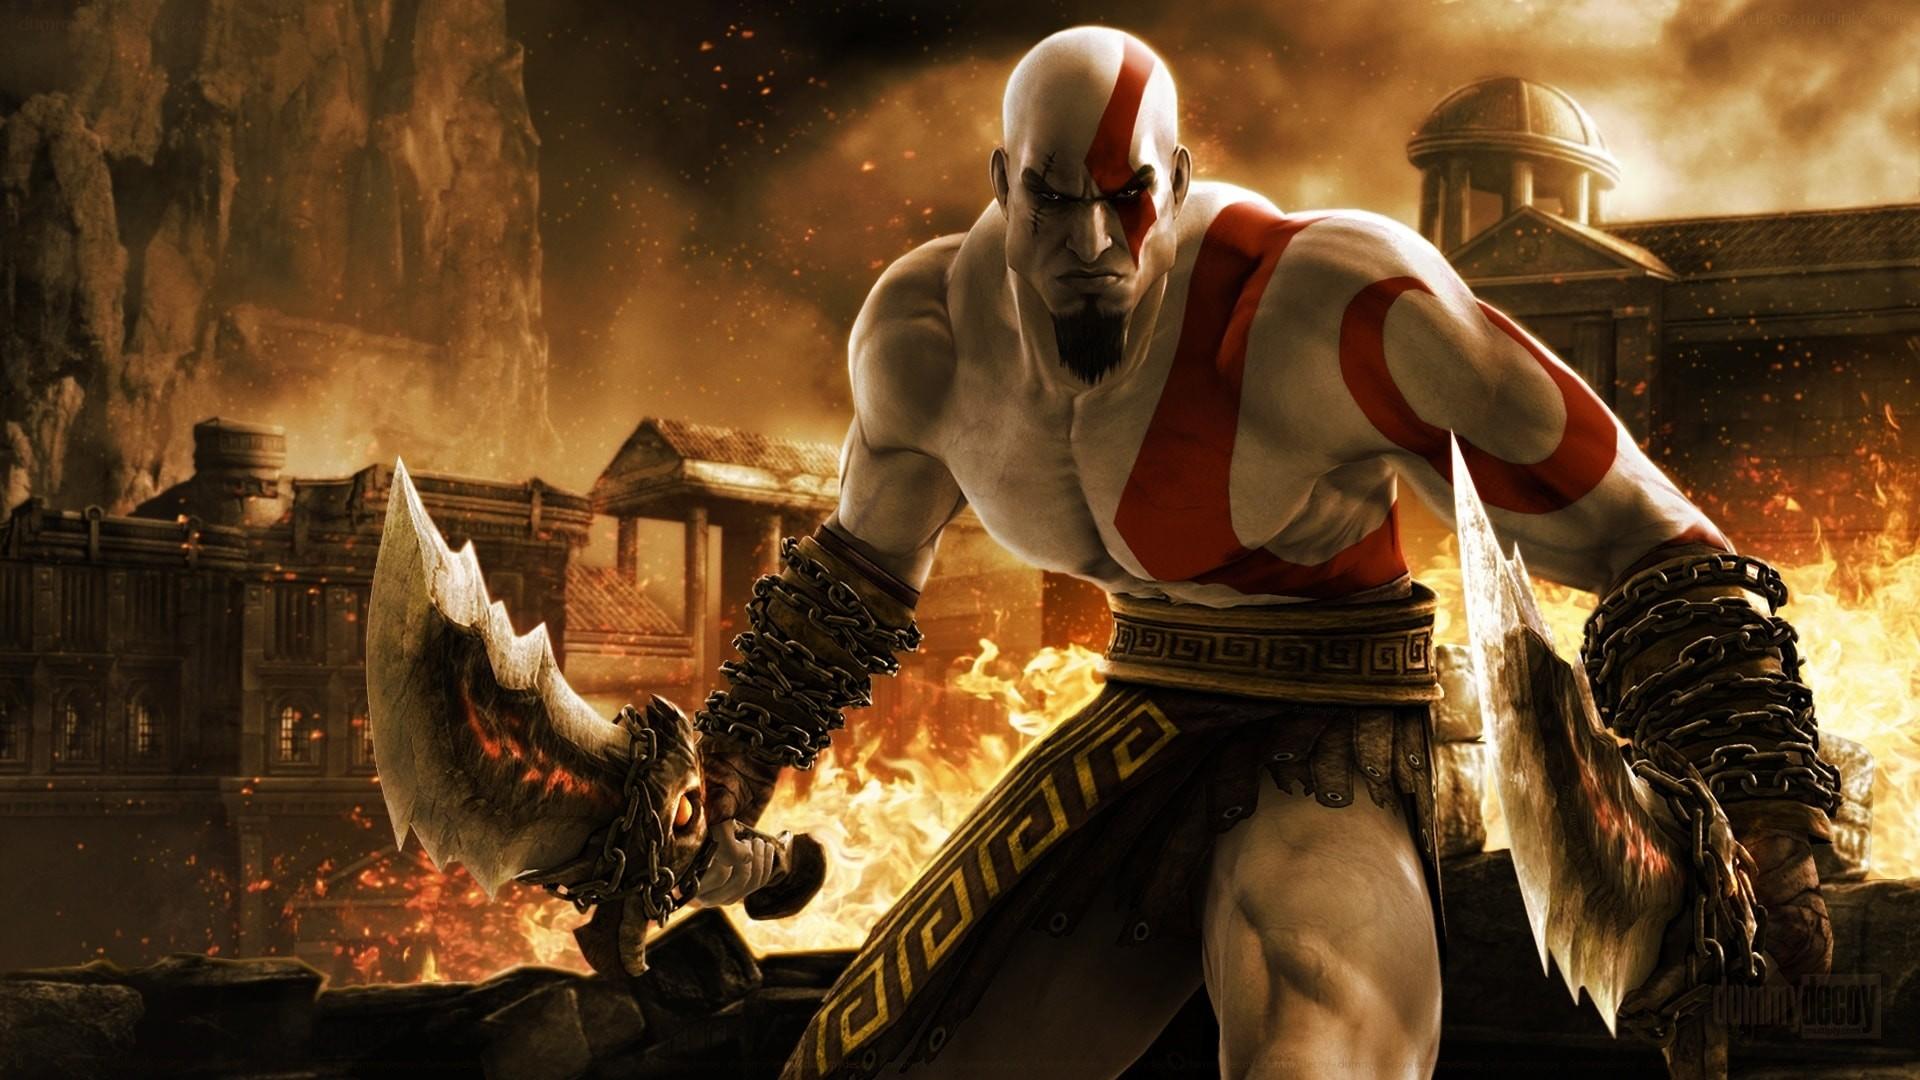 … God Of War 2 full hd wallpapers